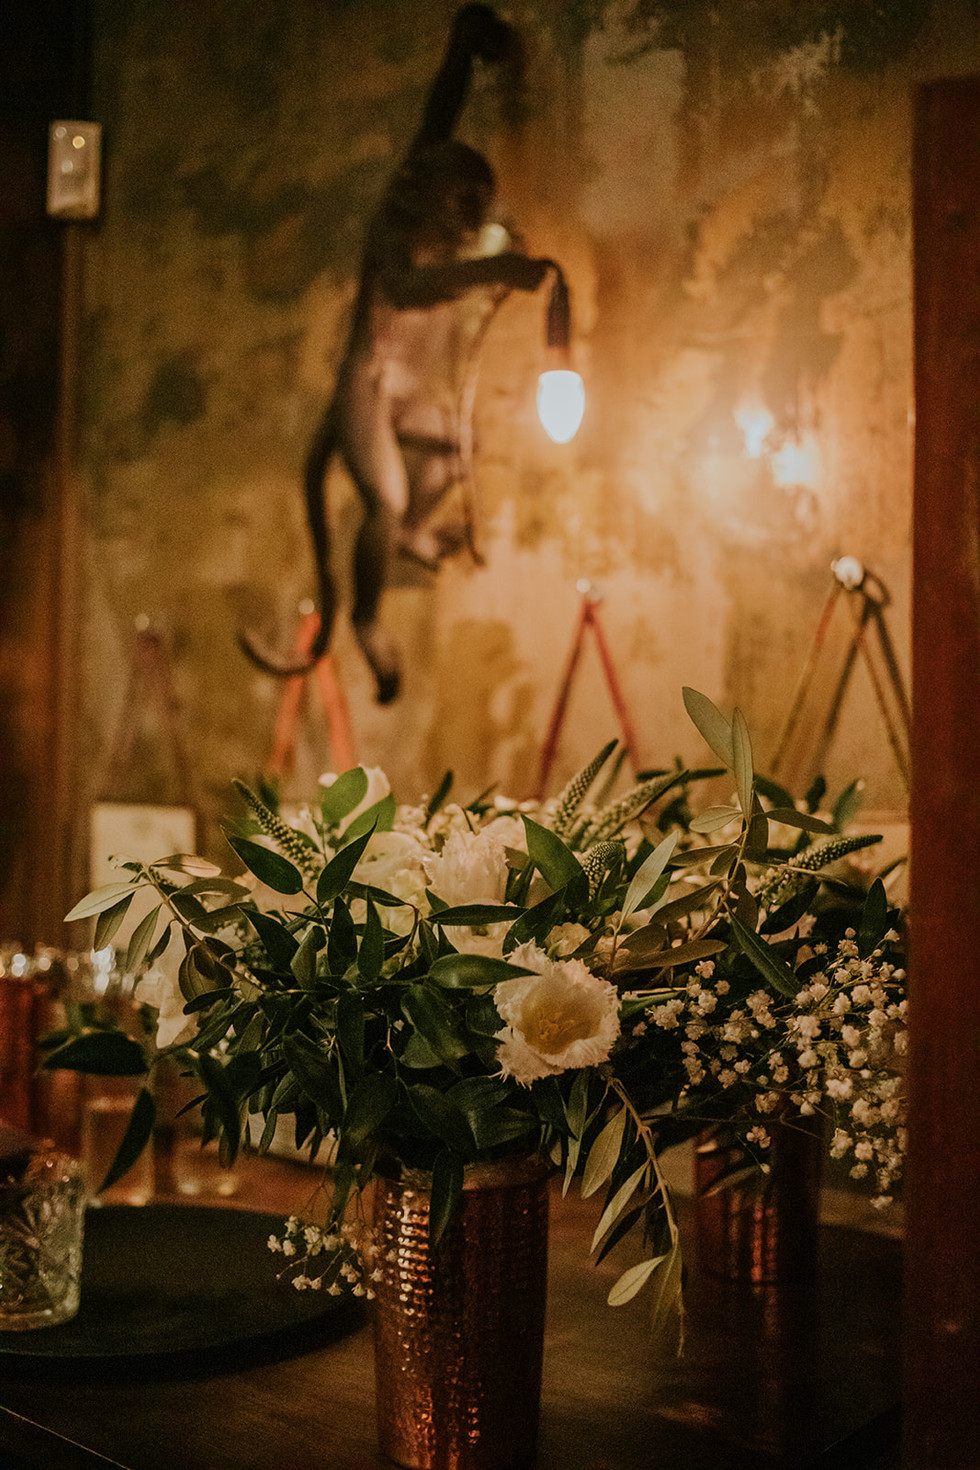 wedding flowers underneath a monkey holding a light